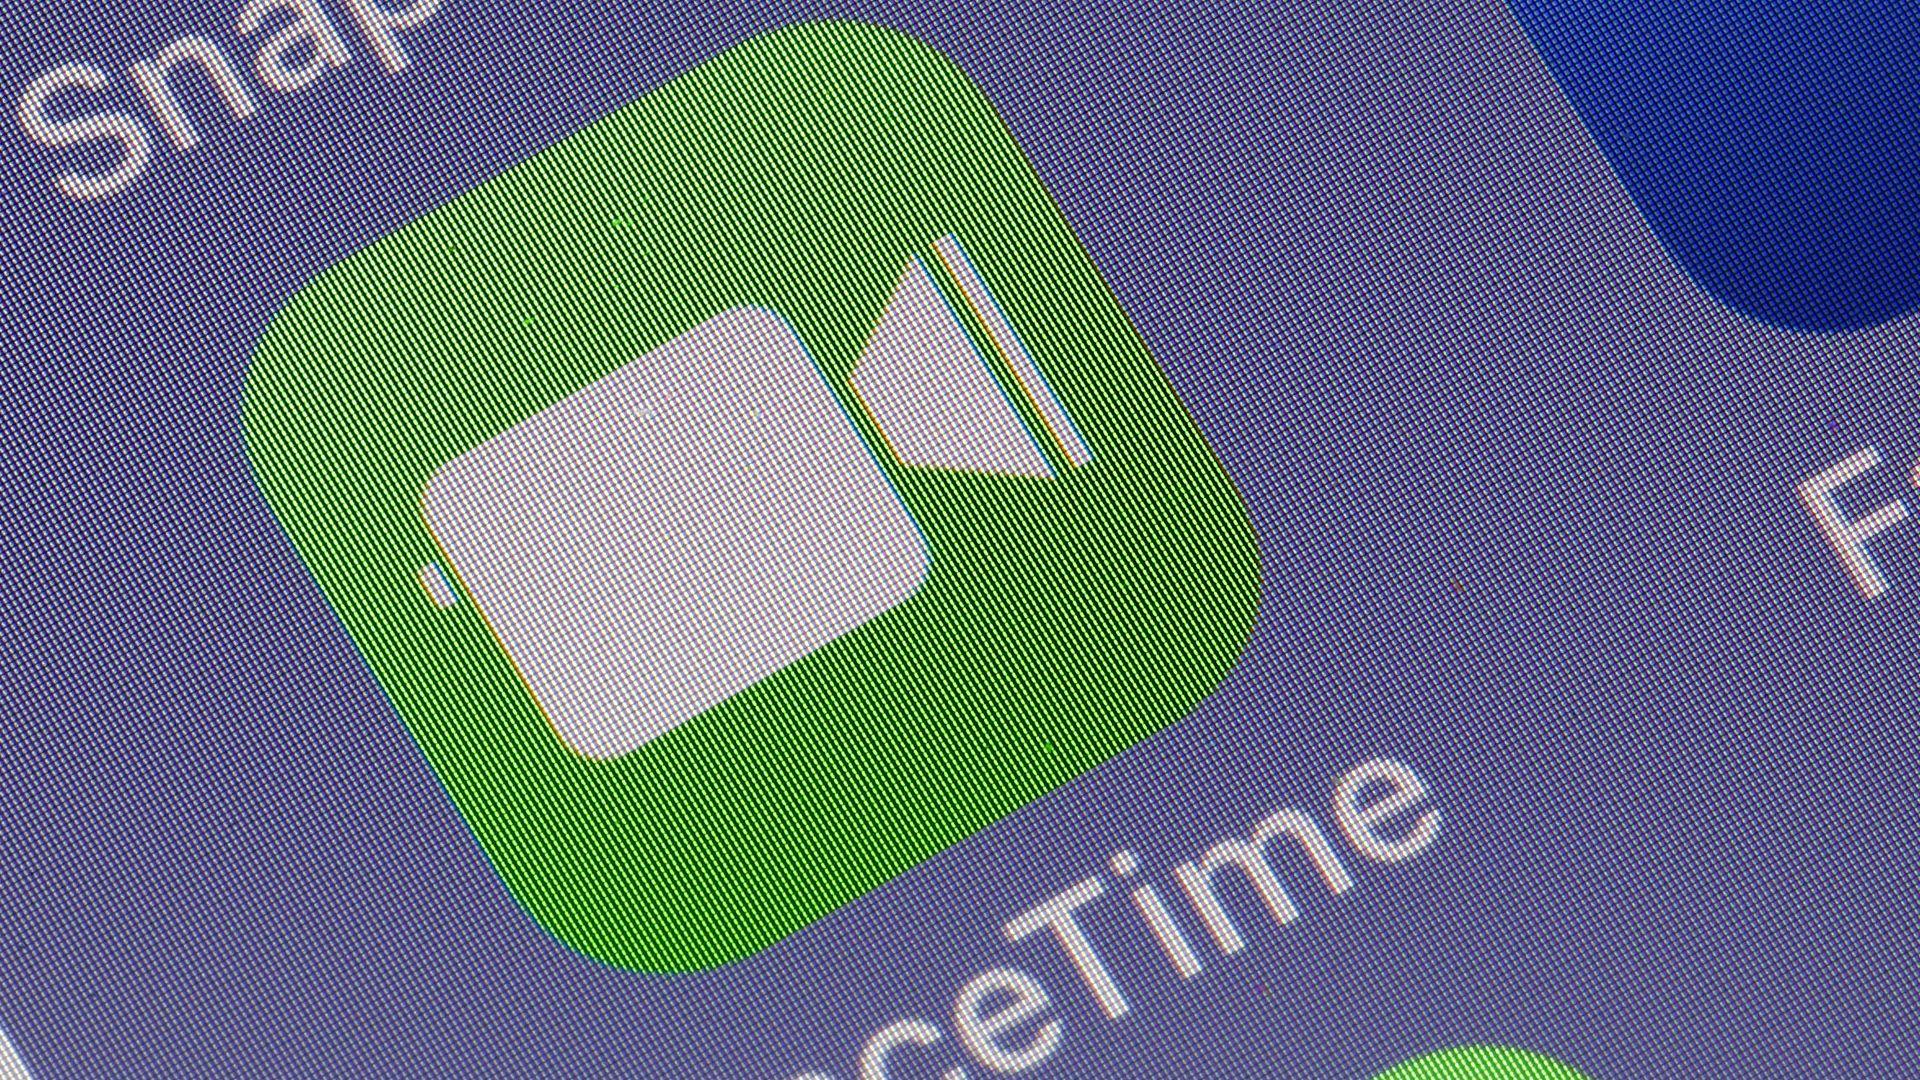 Apple's FaceTime app via Chesnot / Getty Images.